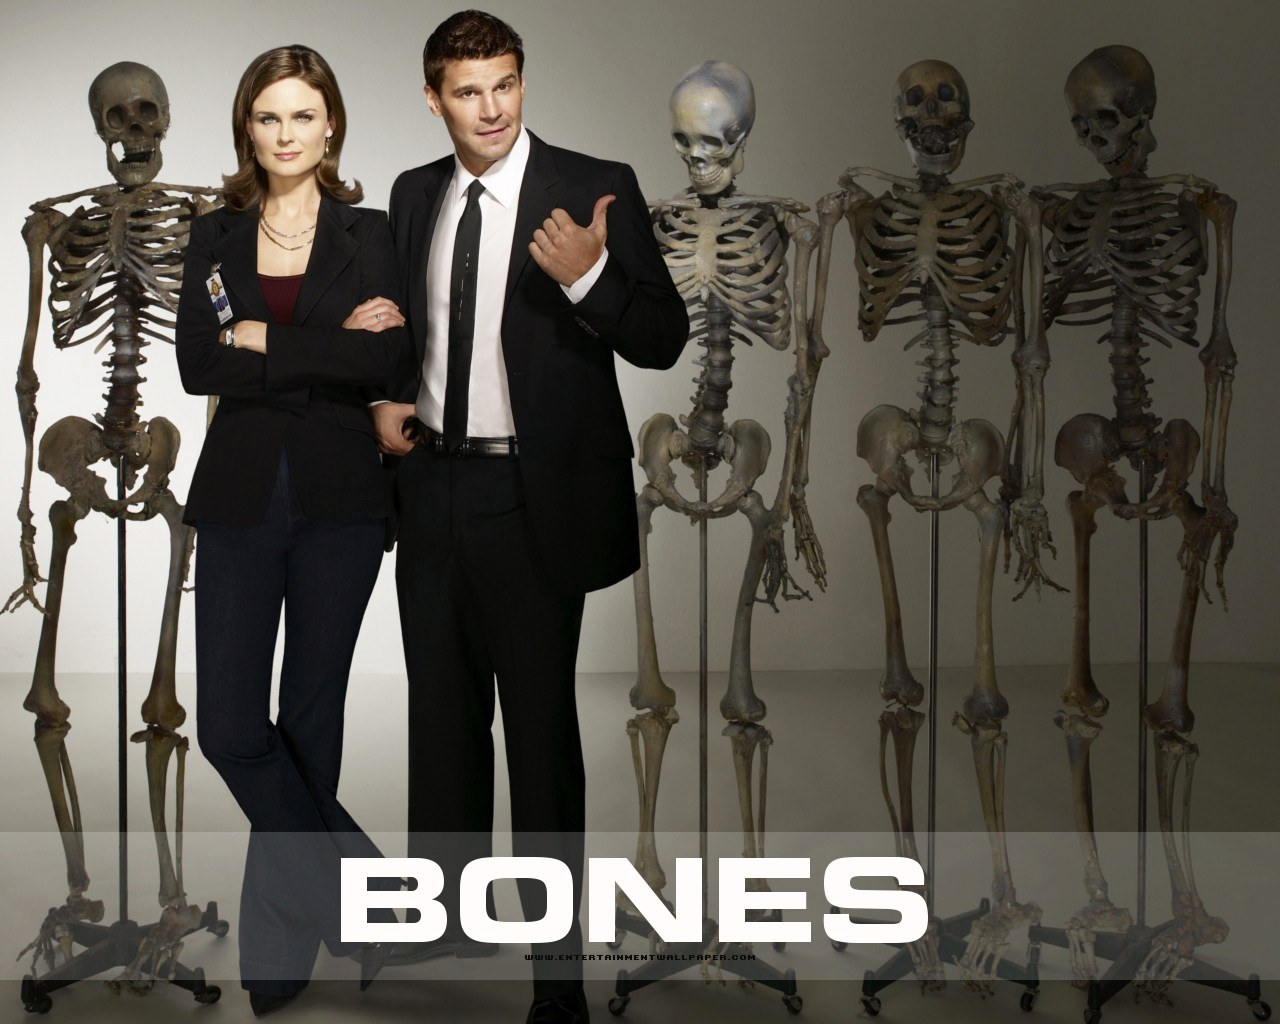 Assistir Online Bones 7ª temporada